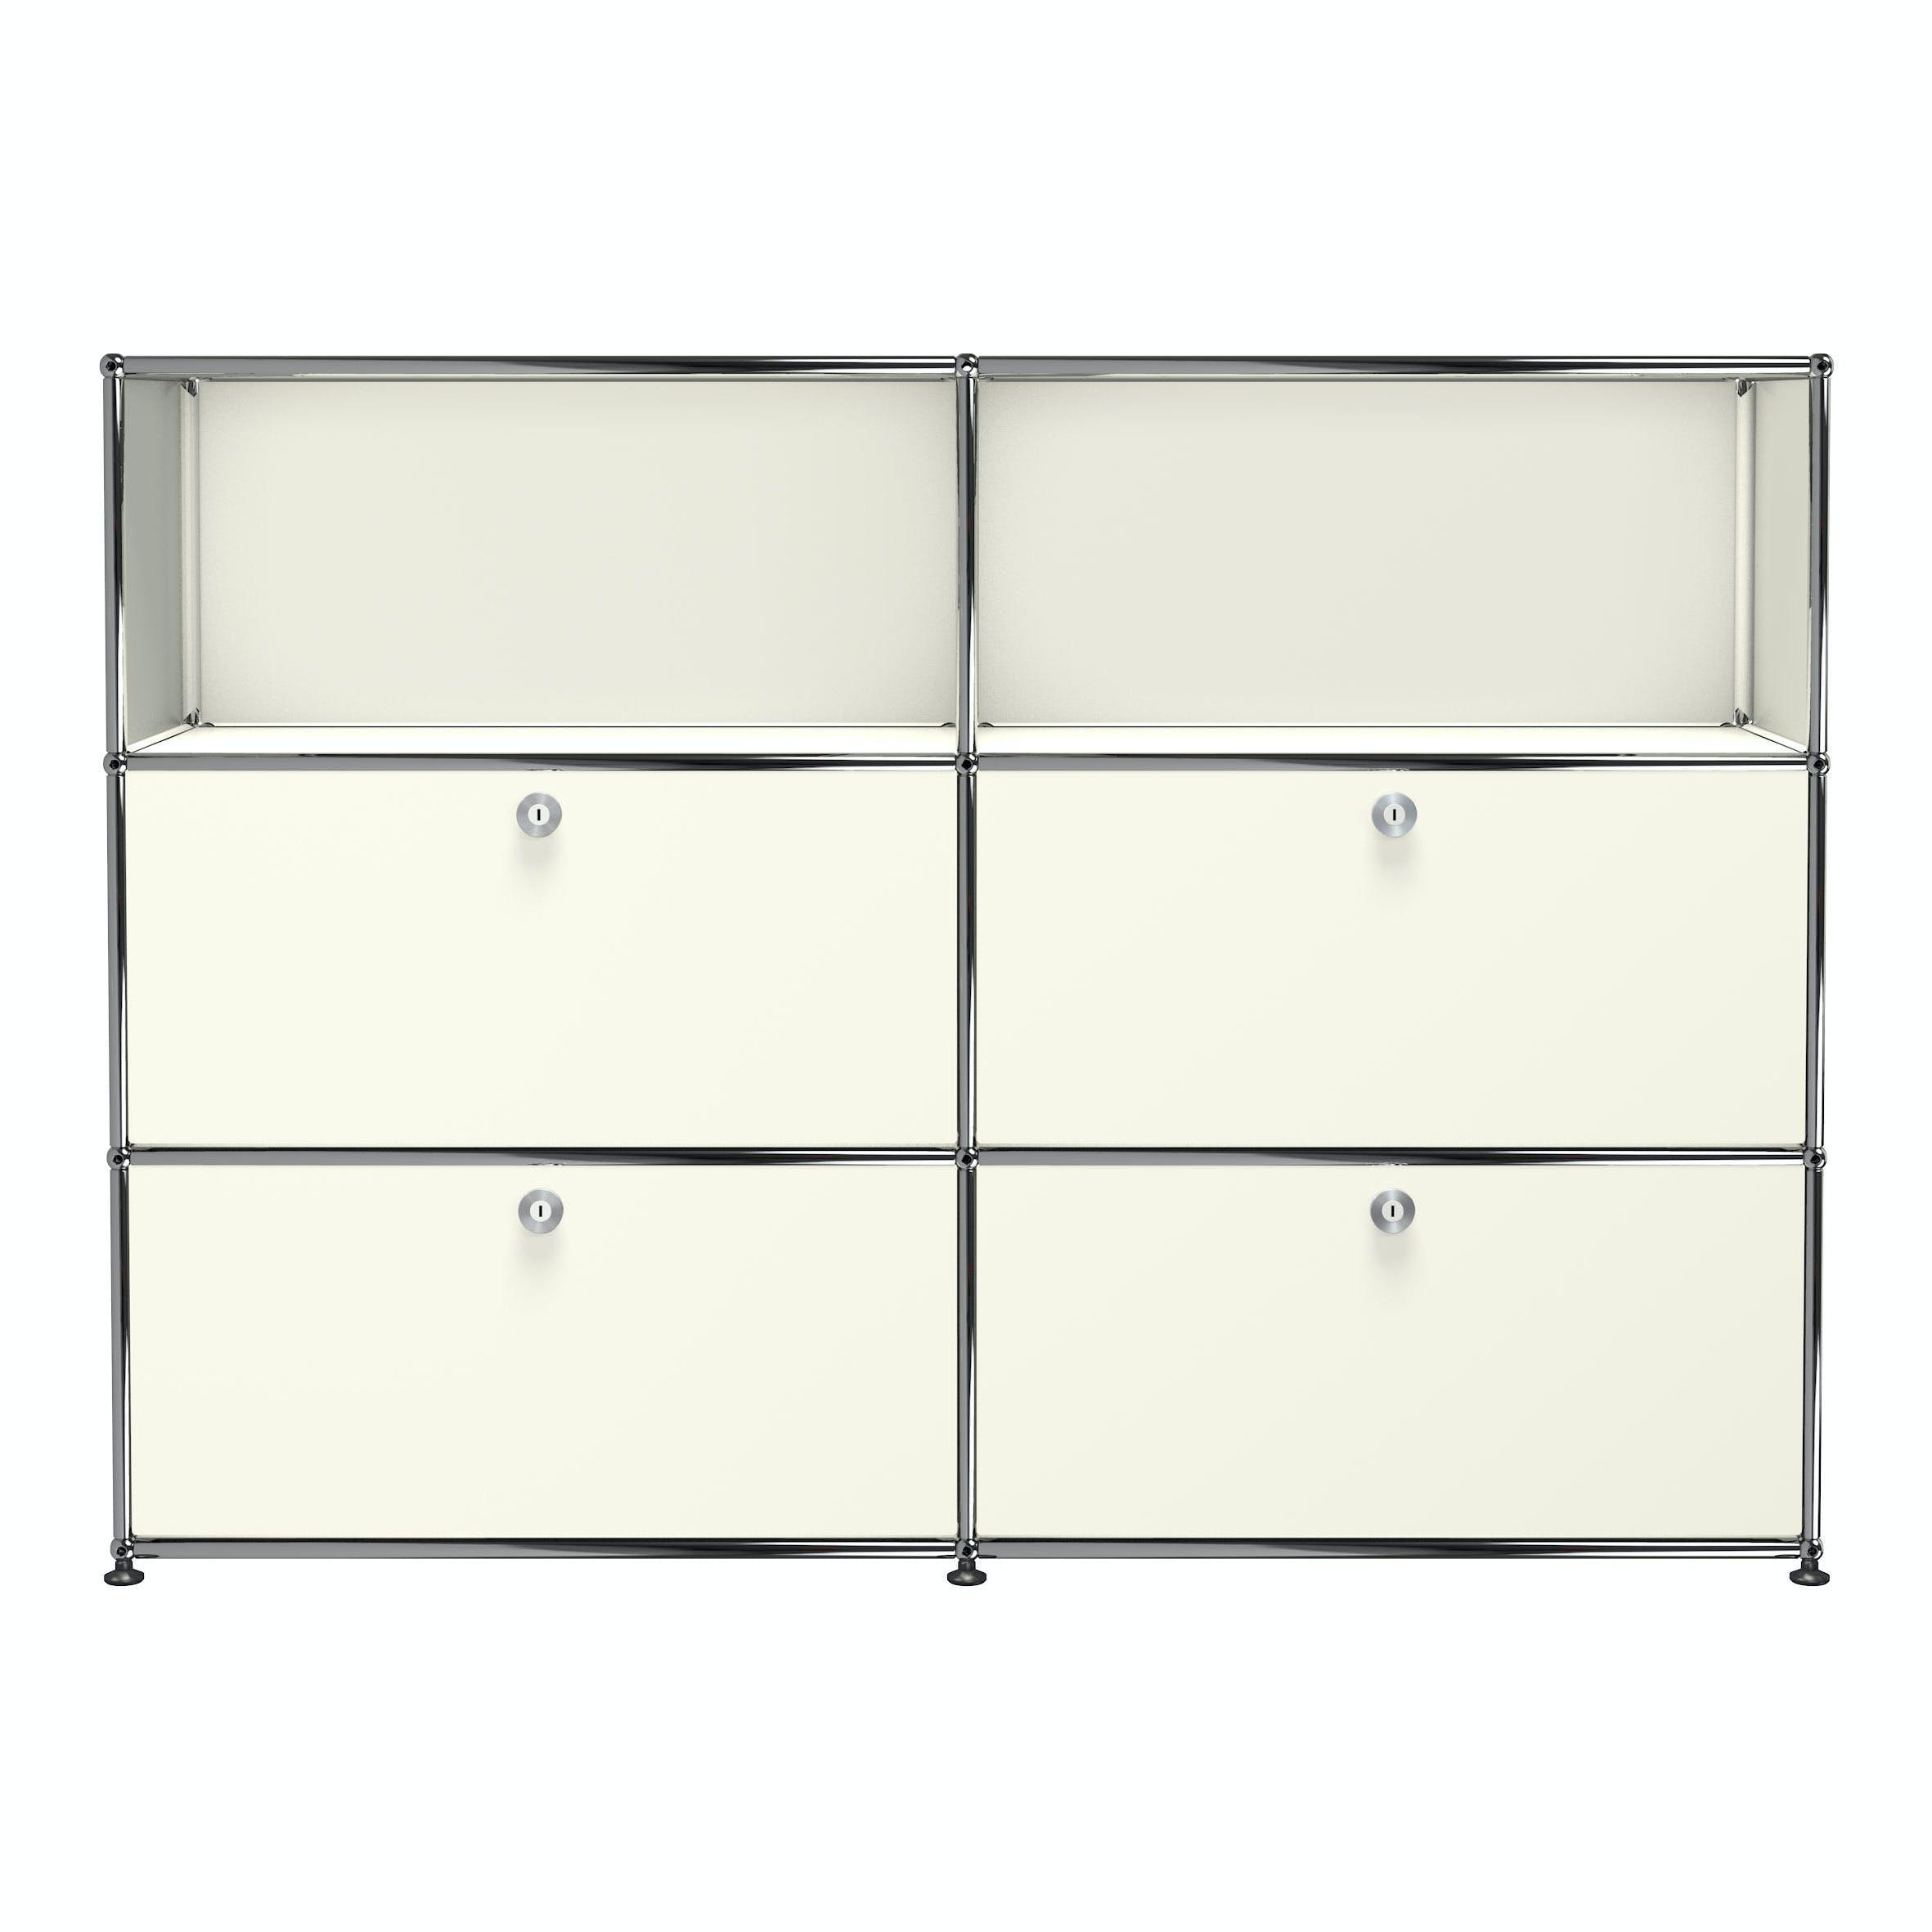 Usm-quick-shop-Haller-Storage-G2A-white-haute-living